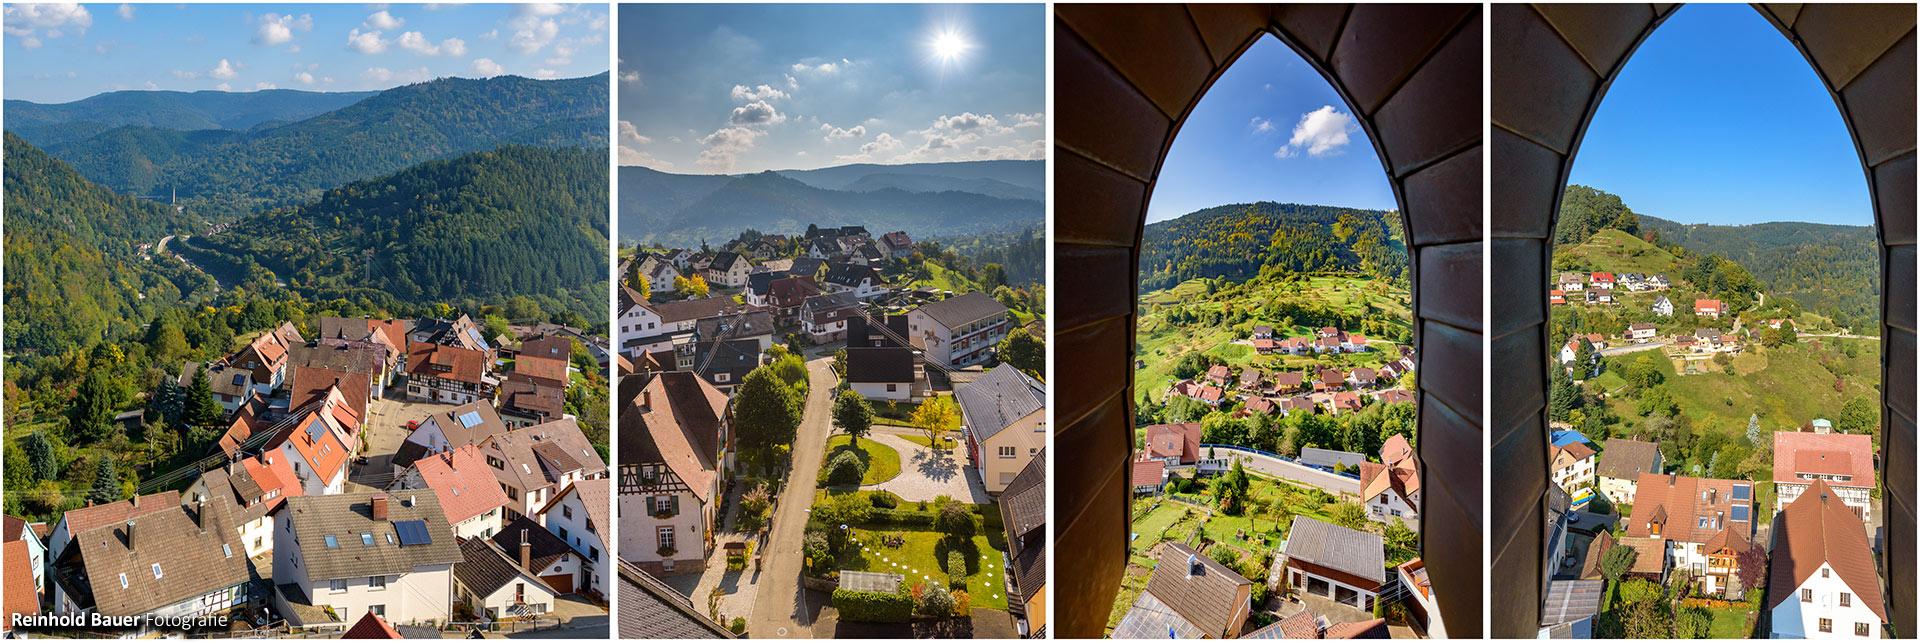 Bermersbach-Kirchturm-Rundumblick.jpg